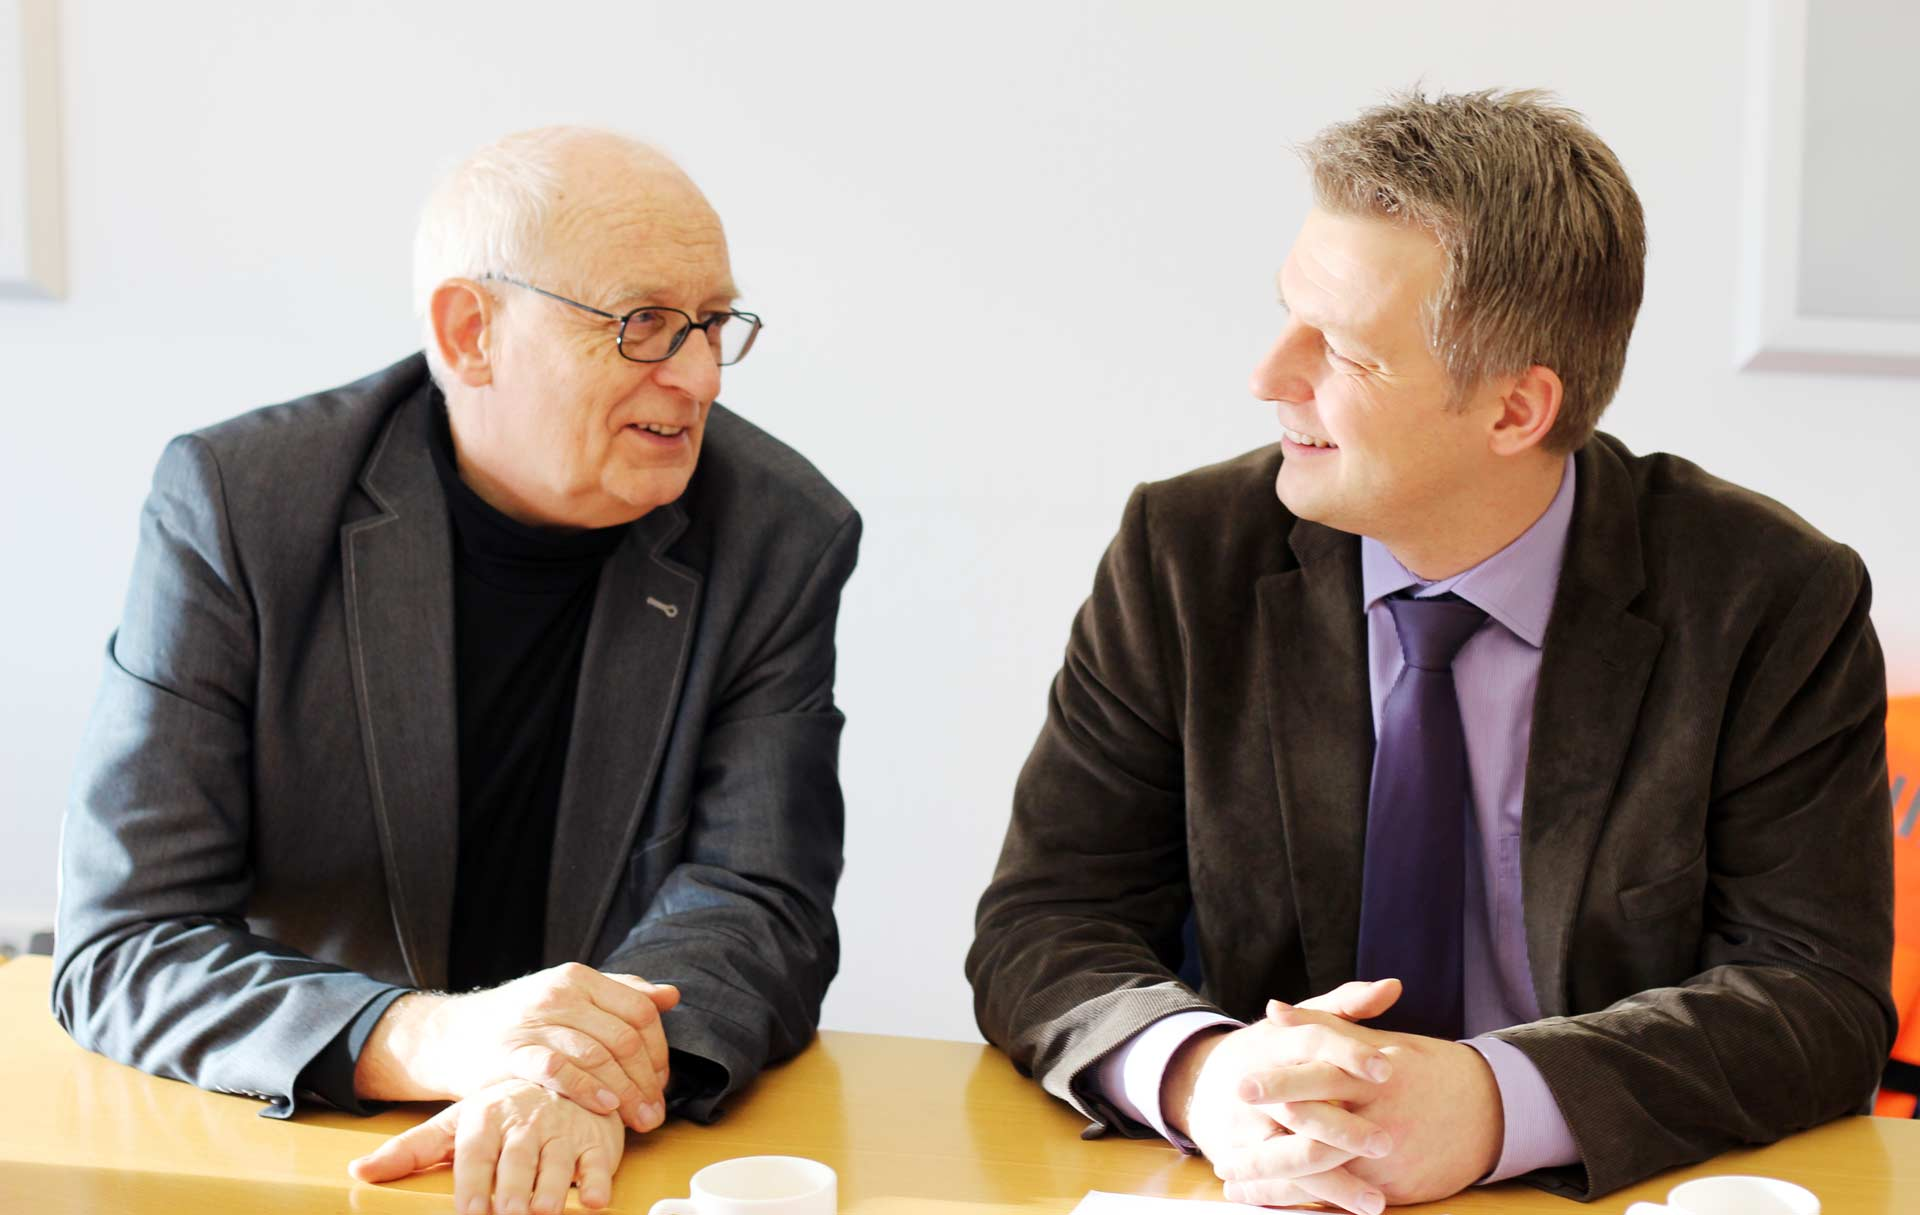 Jan-Ulrich and Benjamin Bernhardt are the CEOs of SECUMAR